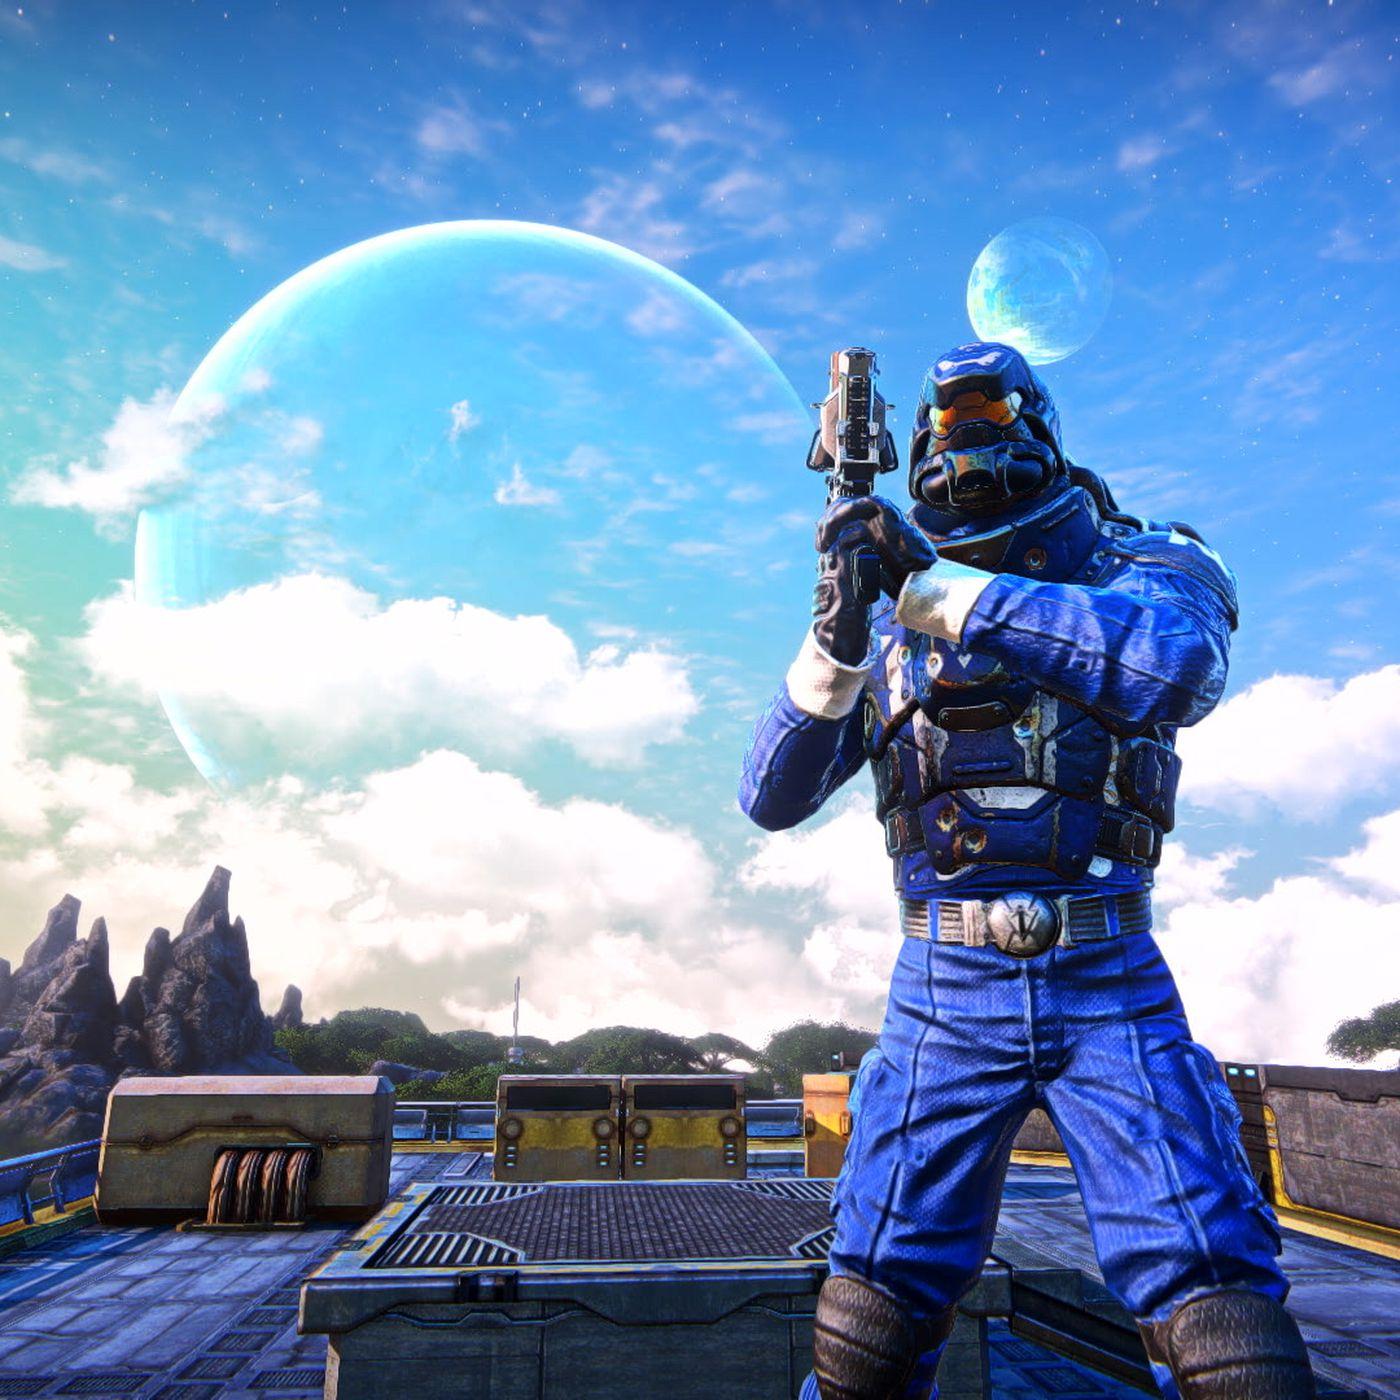 Game grub planetside 2 virtual villagers 2 free download full version games